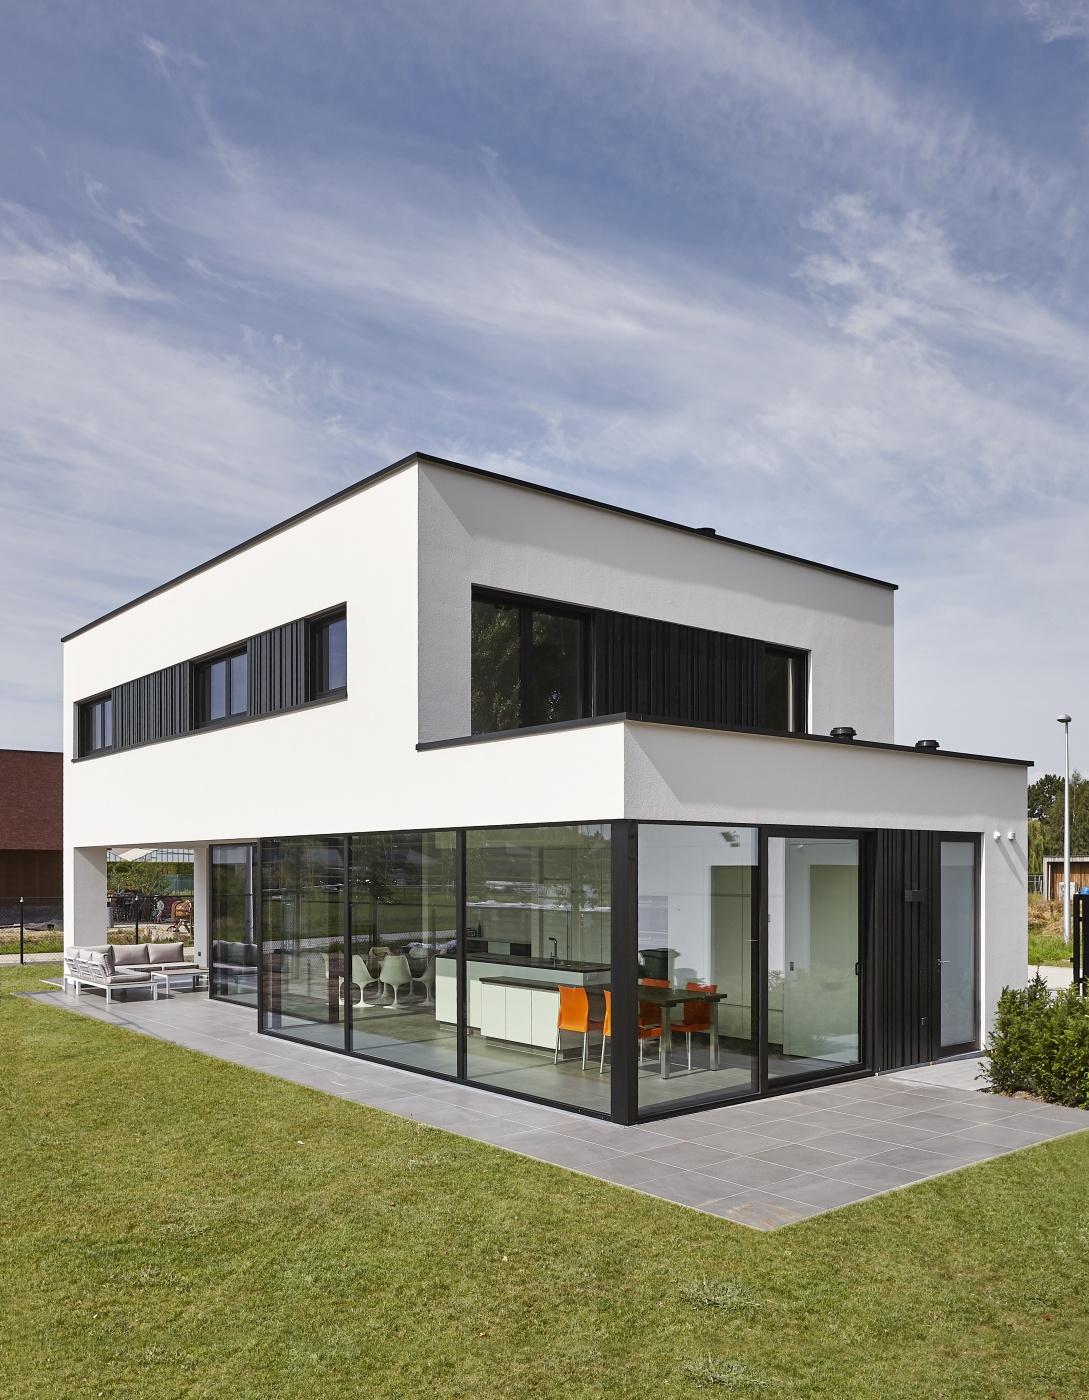 Villabouw dumobil tielt west vlaanderen for Woningen moderne villa